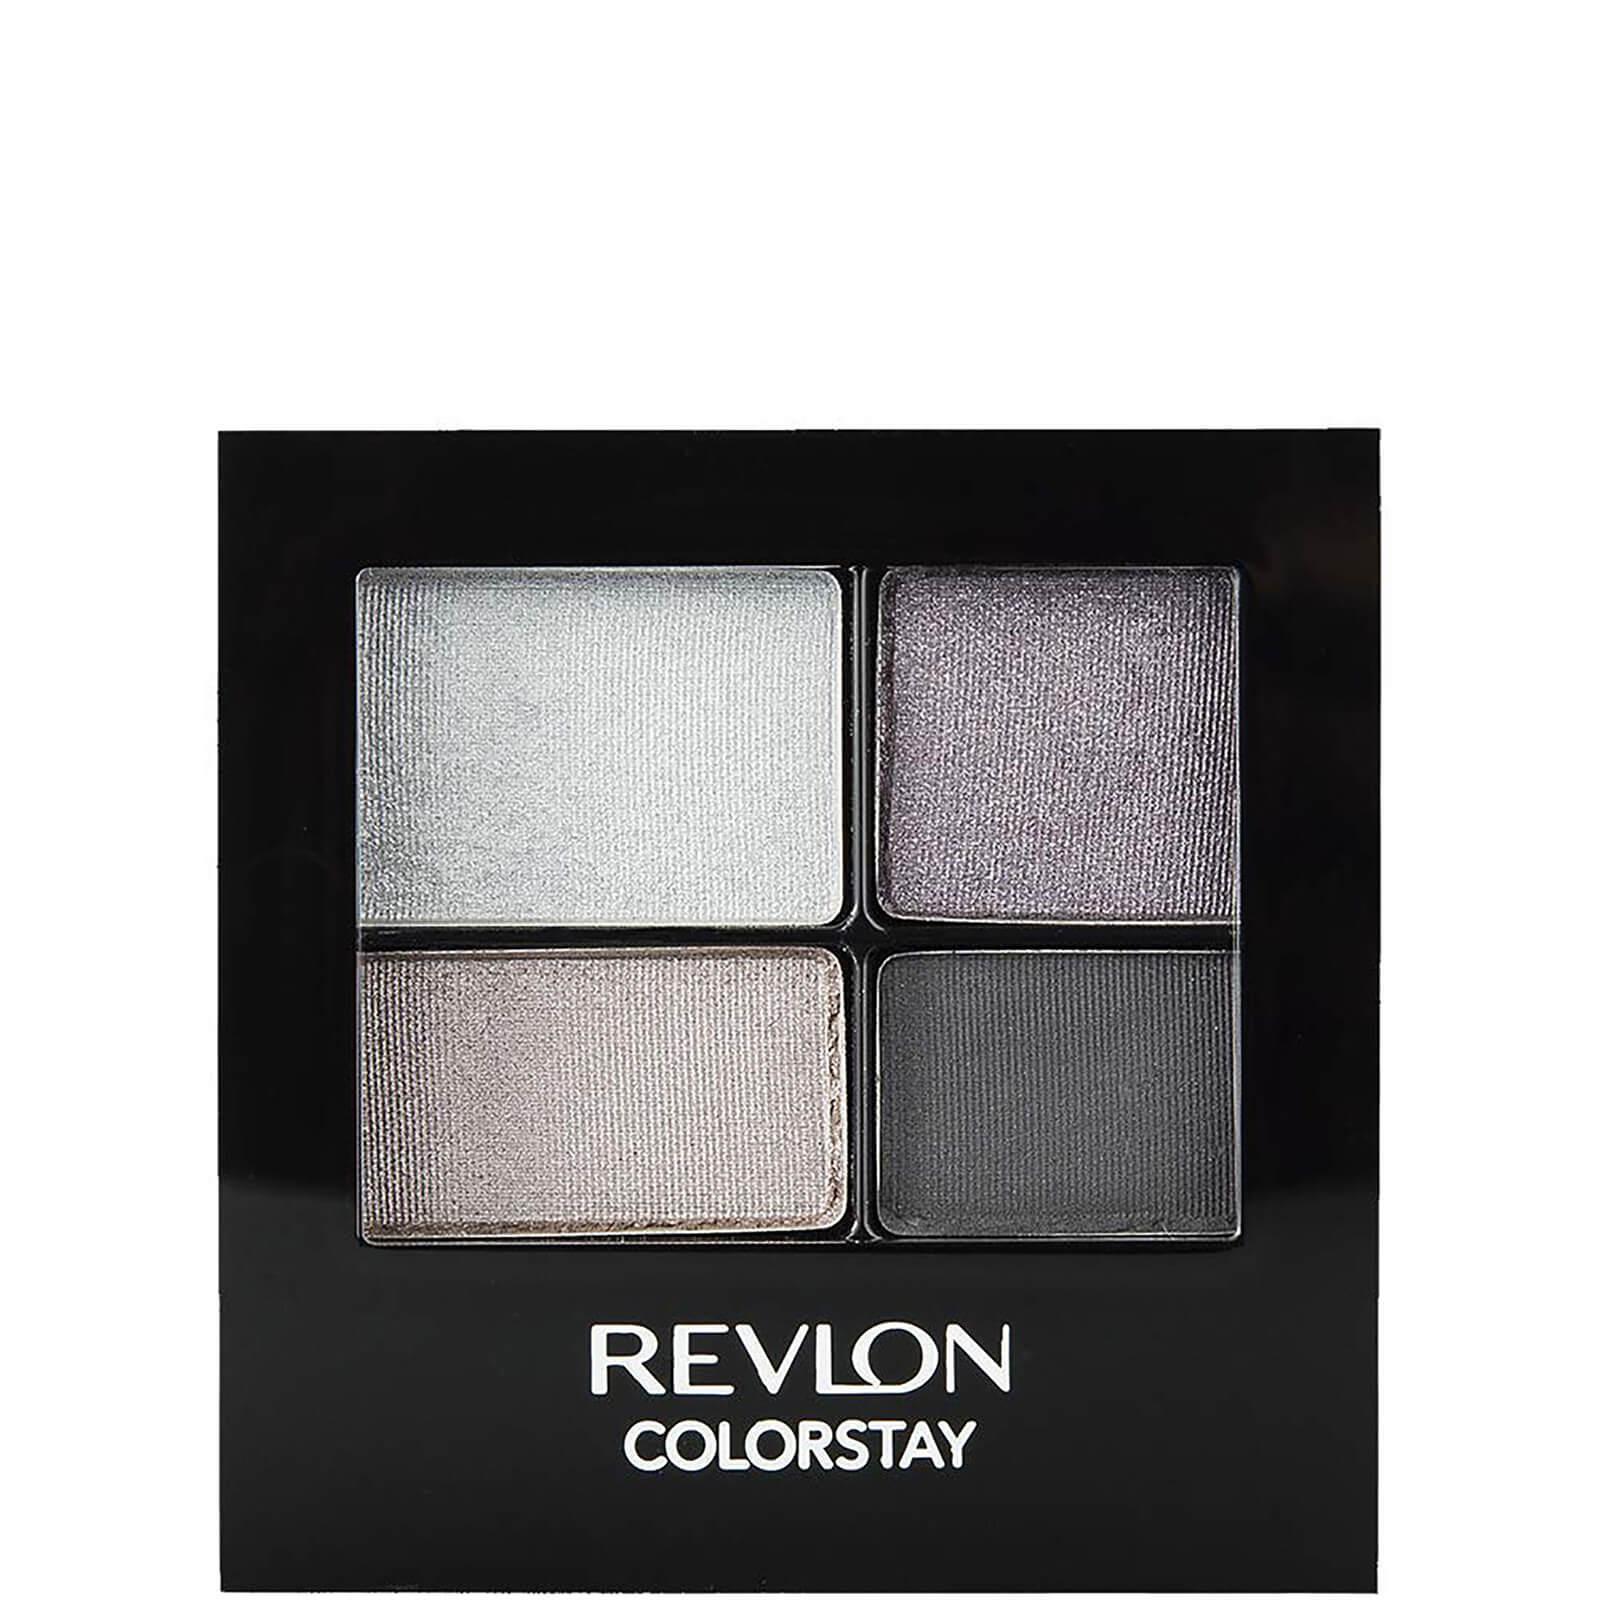 Revlon Colorstay 16 Hour Eyeshadow Quad - Siren